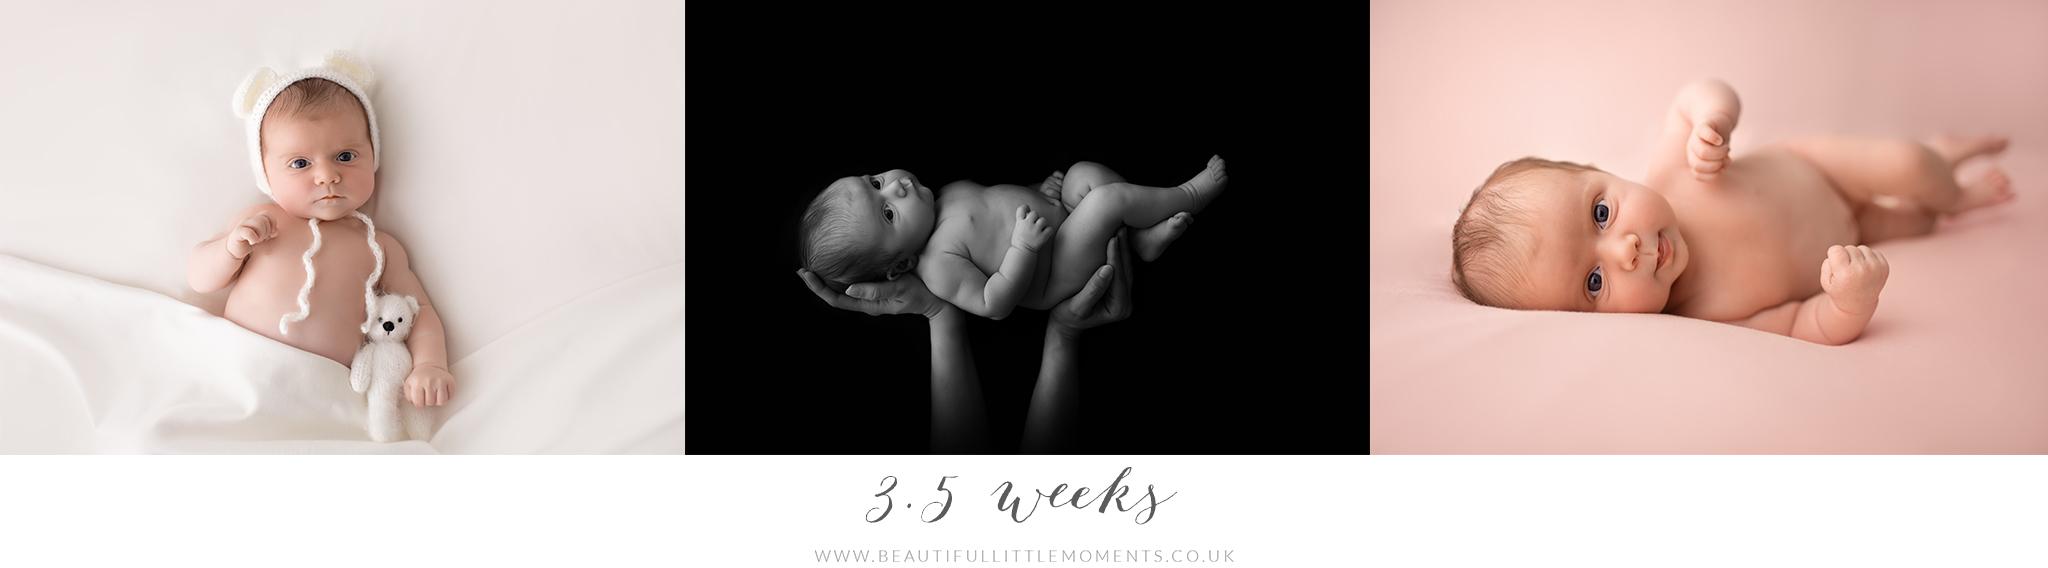 baby photos 3.5 weeks